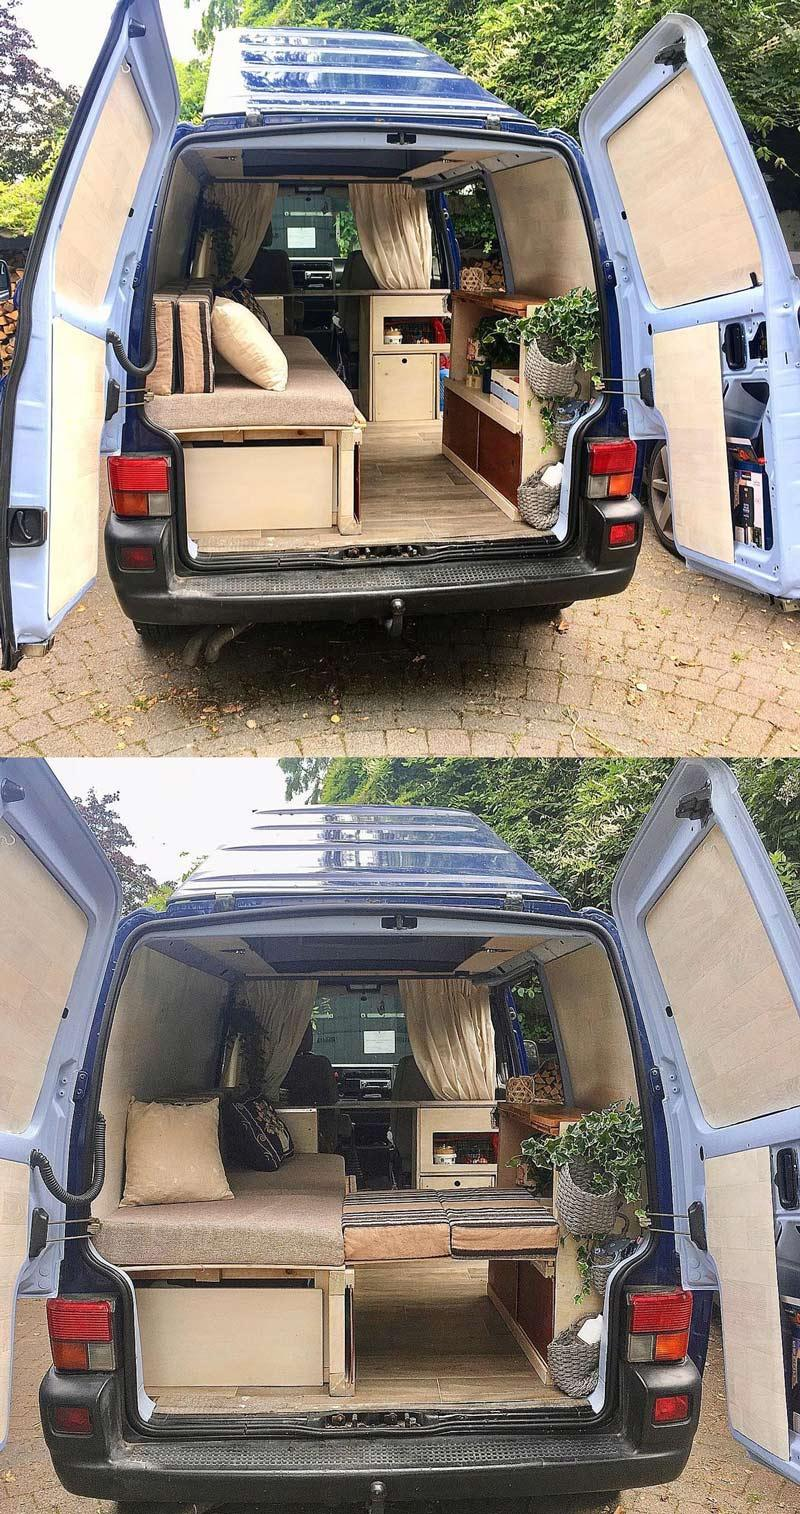 vw t4 minivan camper converison